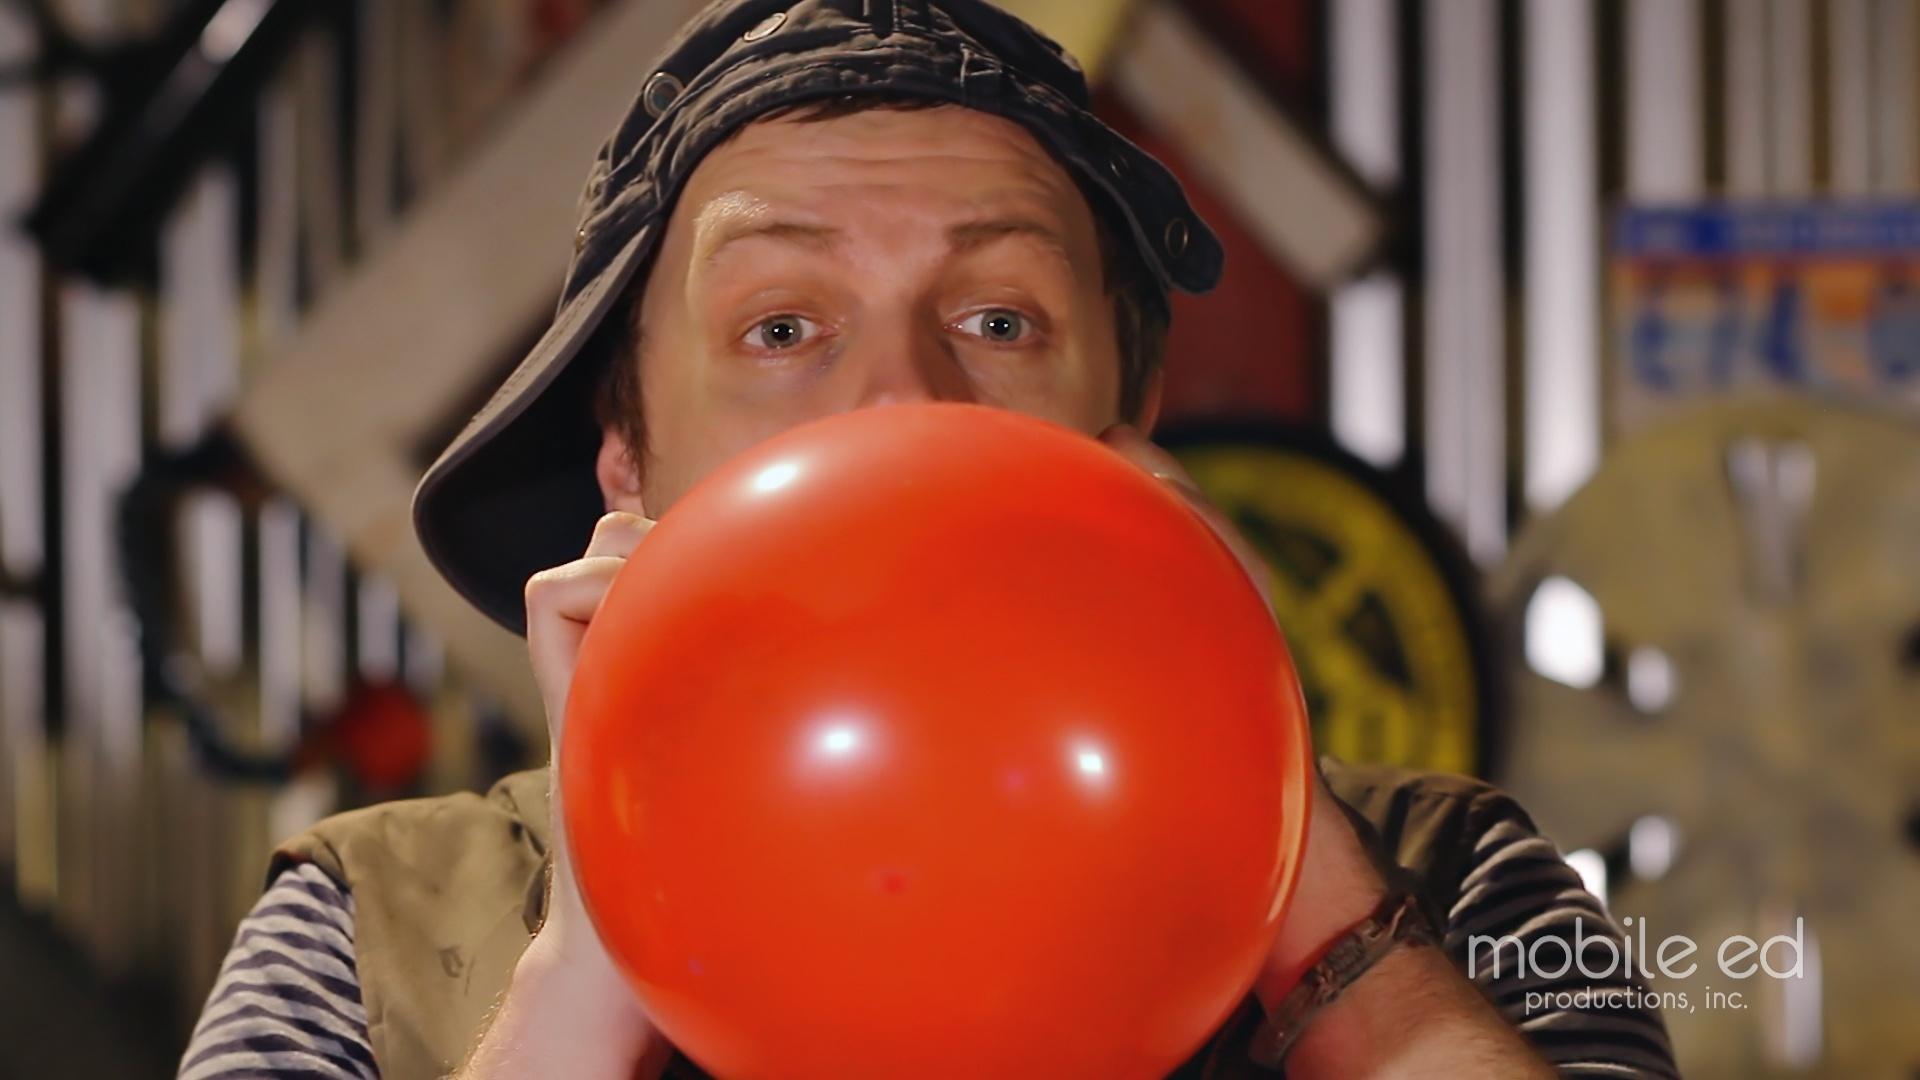 Make the Ball   Handy Dan the Junkyard Man   Mobile Ed Productions